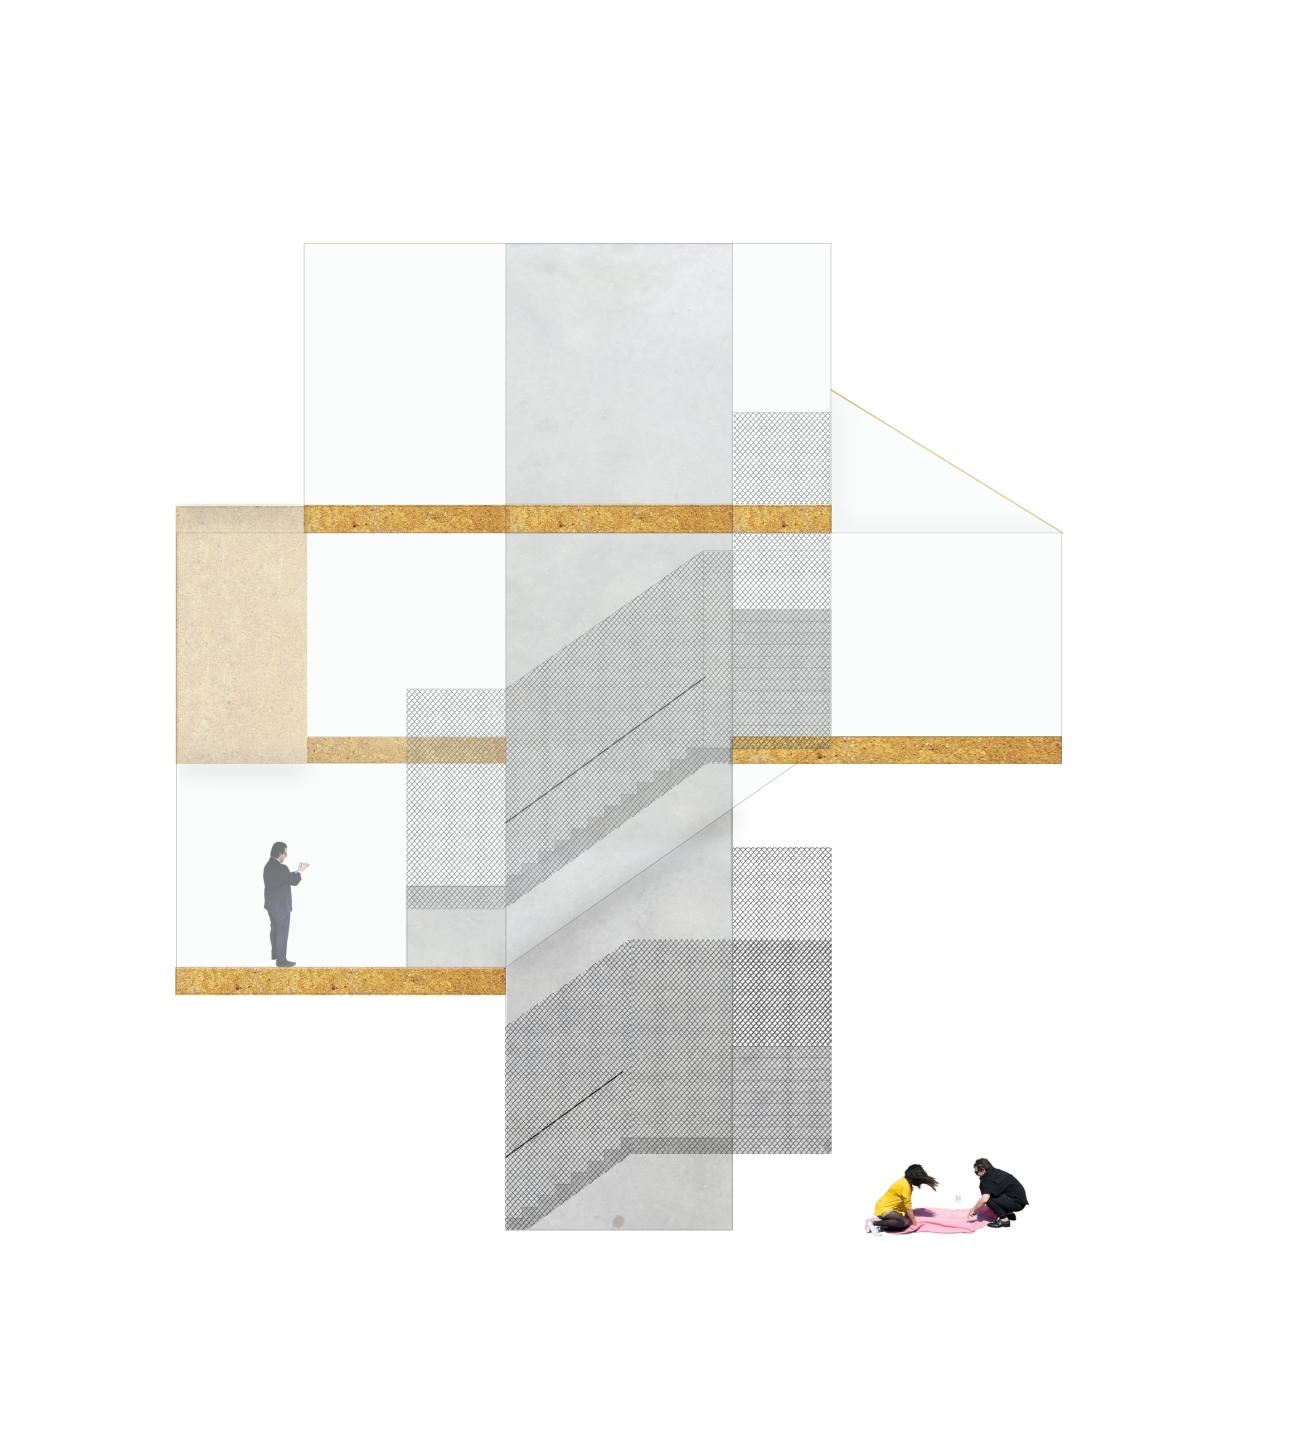 /Users/patrycjakomada/Desktop/170226_building.dwg